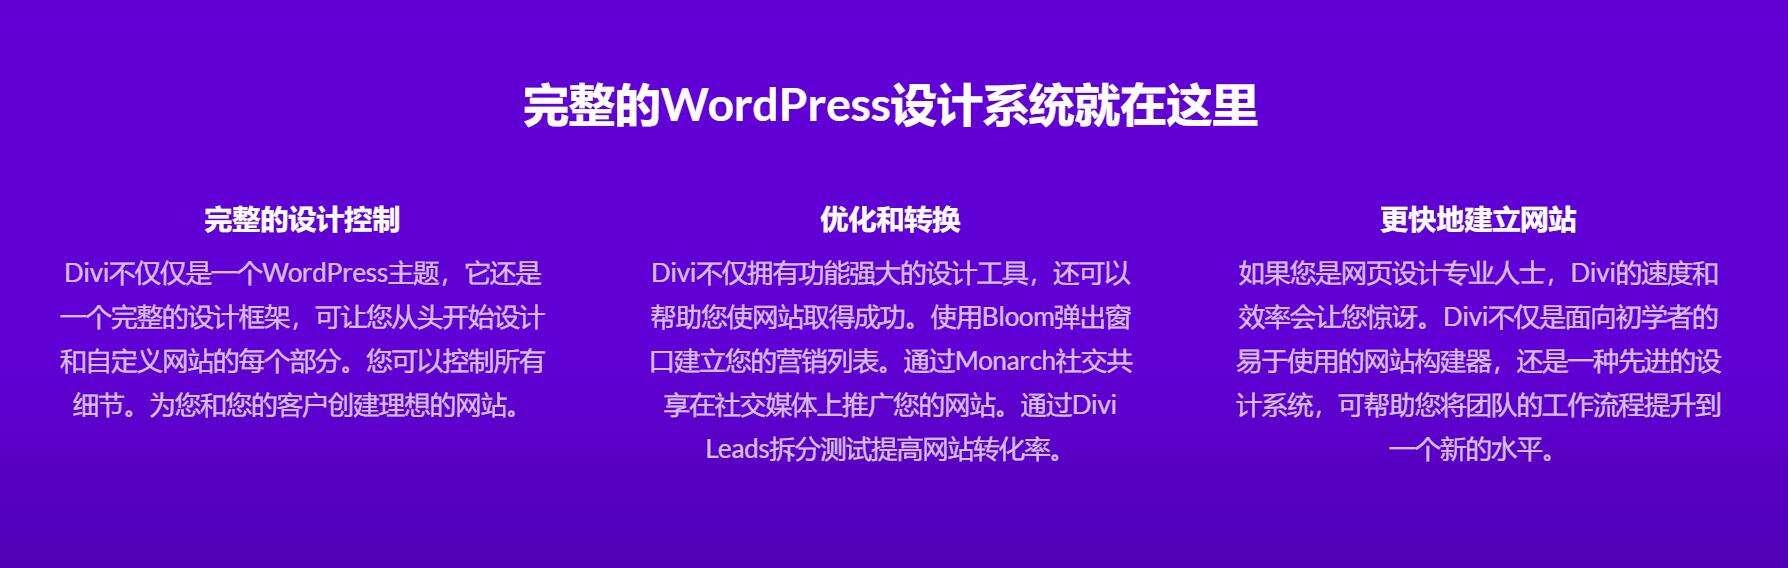 Divi 4.4.3 包含key密匙 WP主题企业中文模板自适应简约科技支持SEO插图4